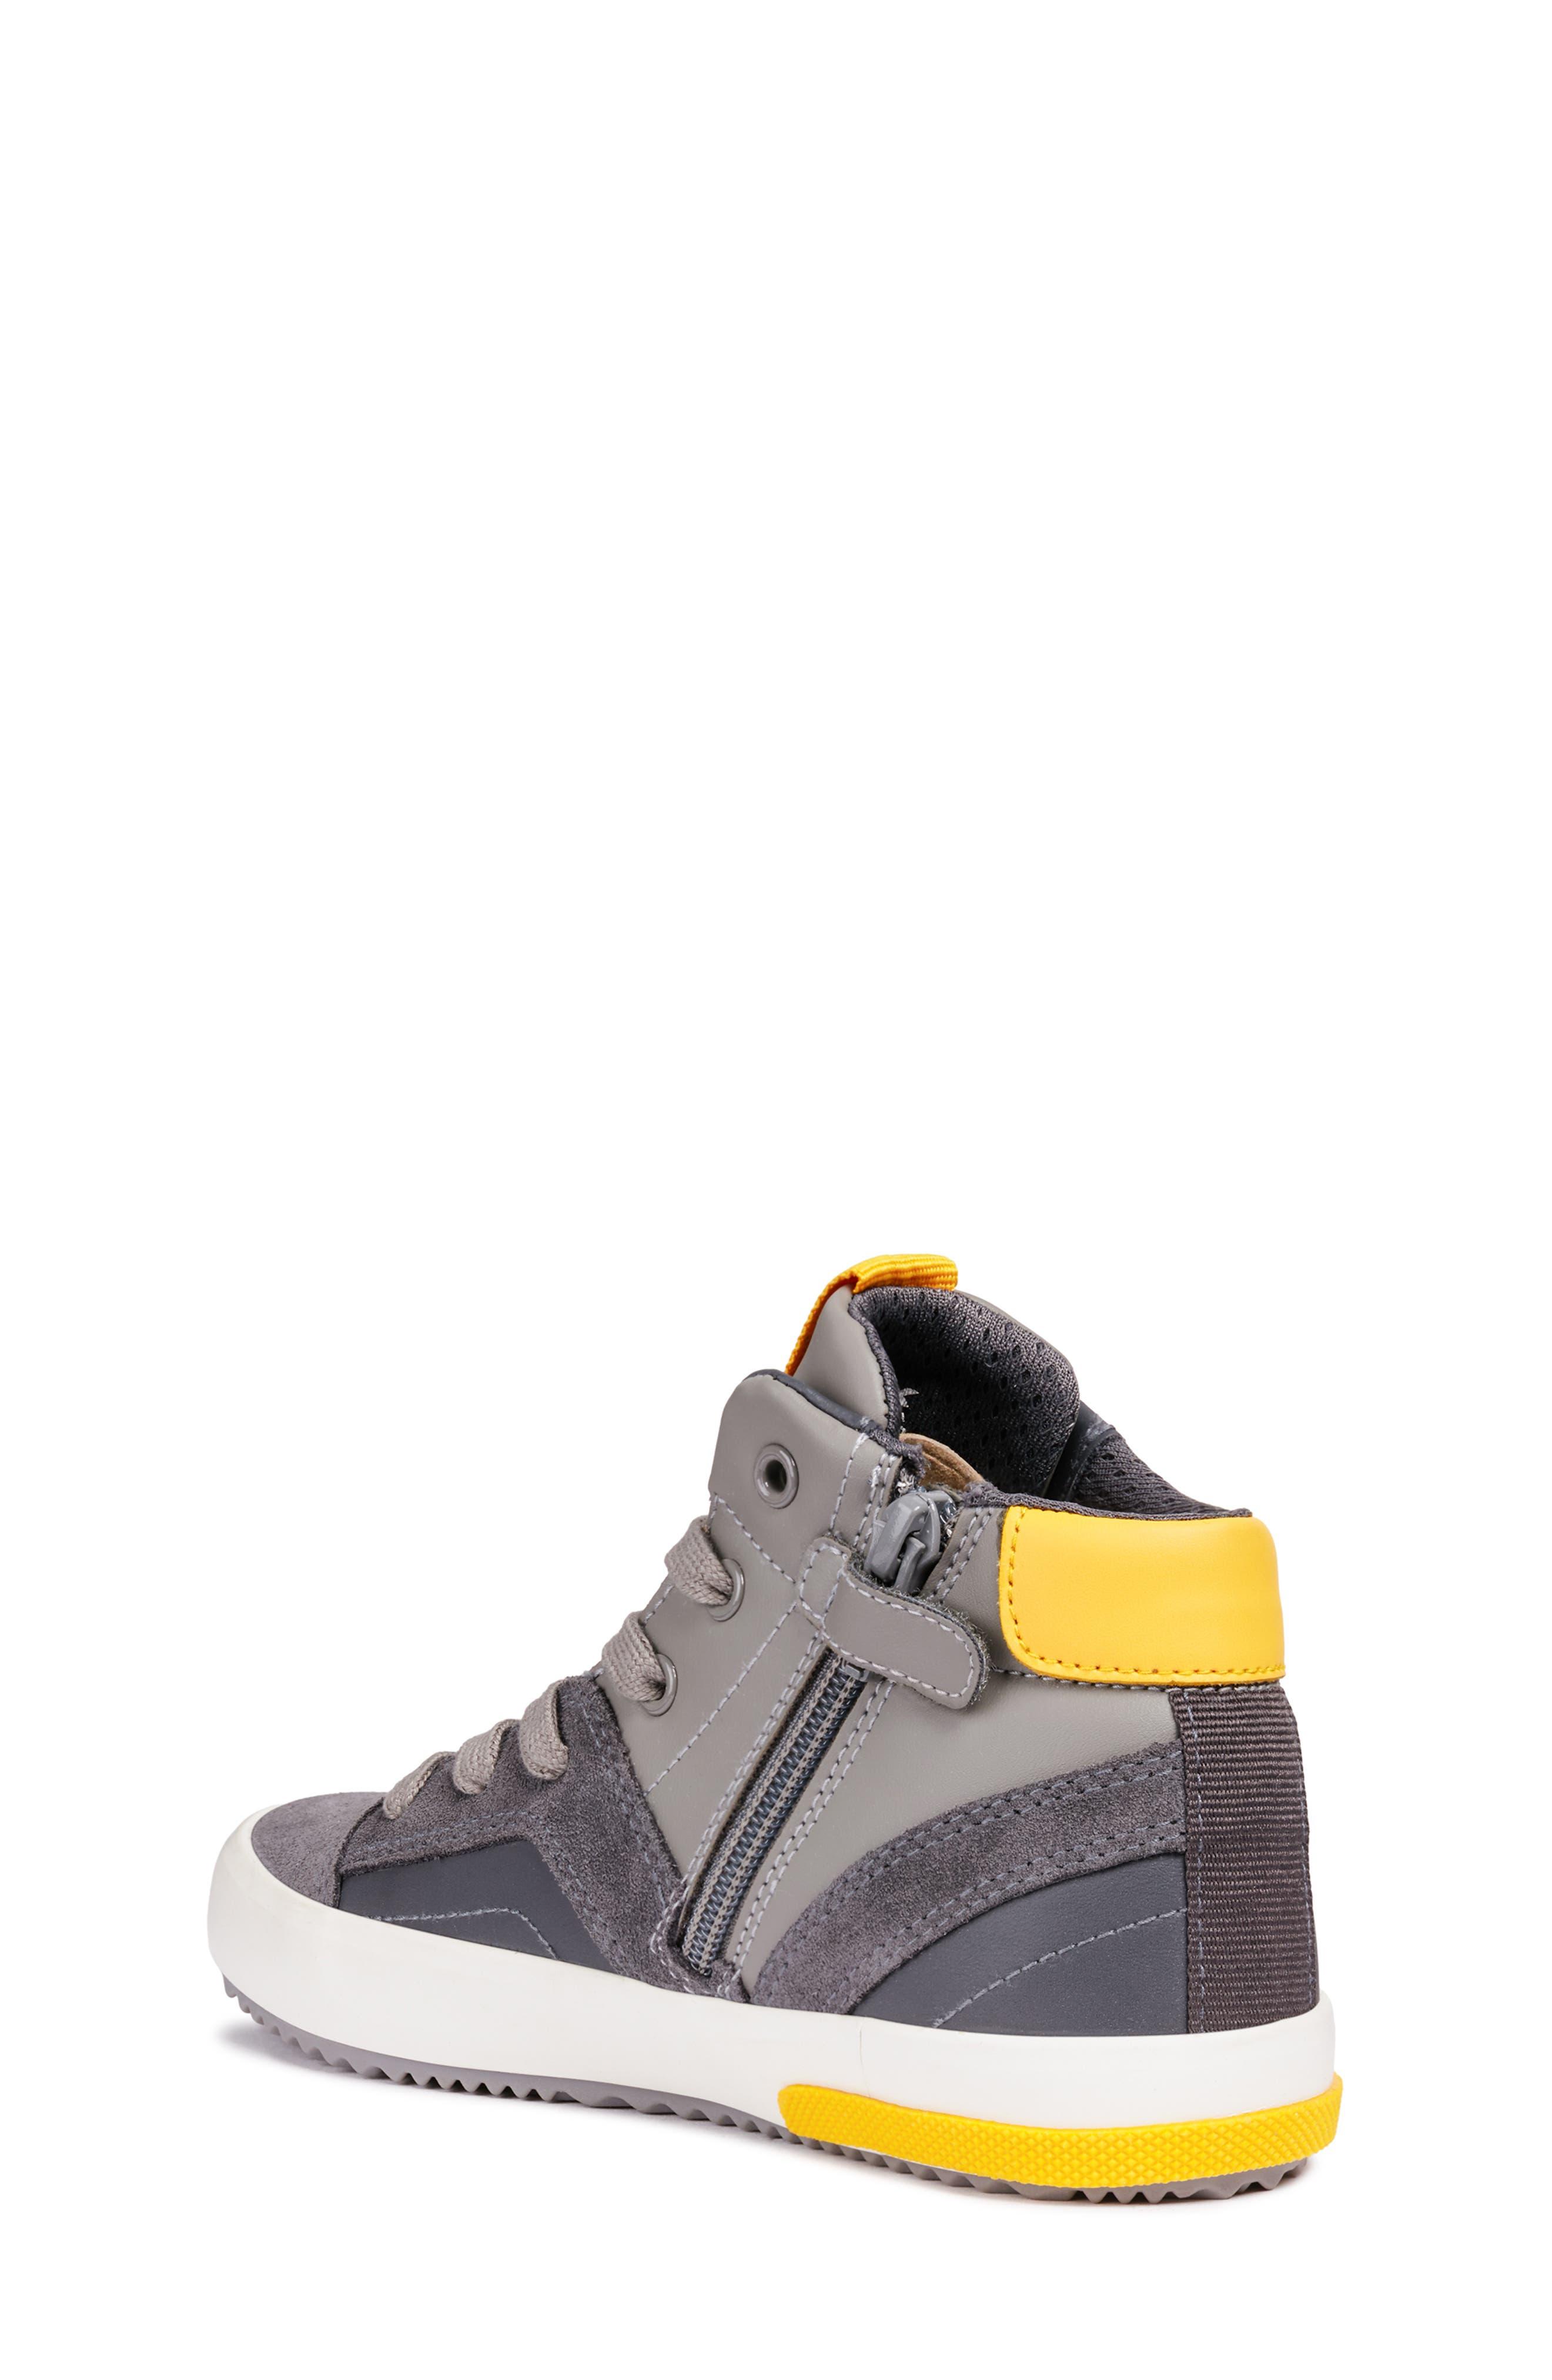 Alonisso 24 High Top Sneaker,                             Alternate thumbnail 2, color,                             DARK GREY/YELLOW